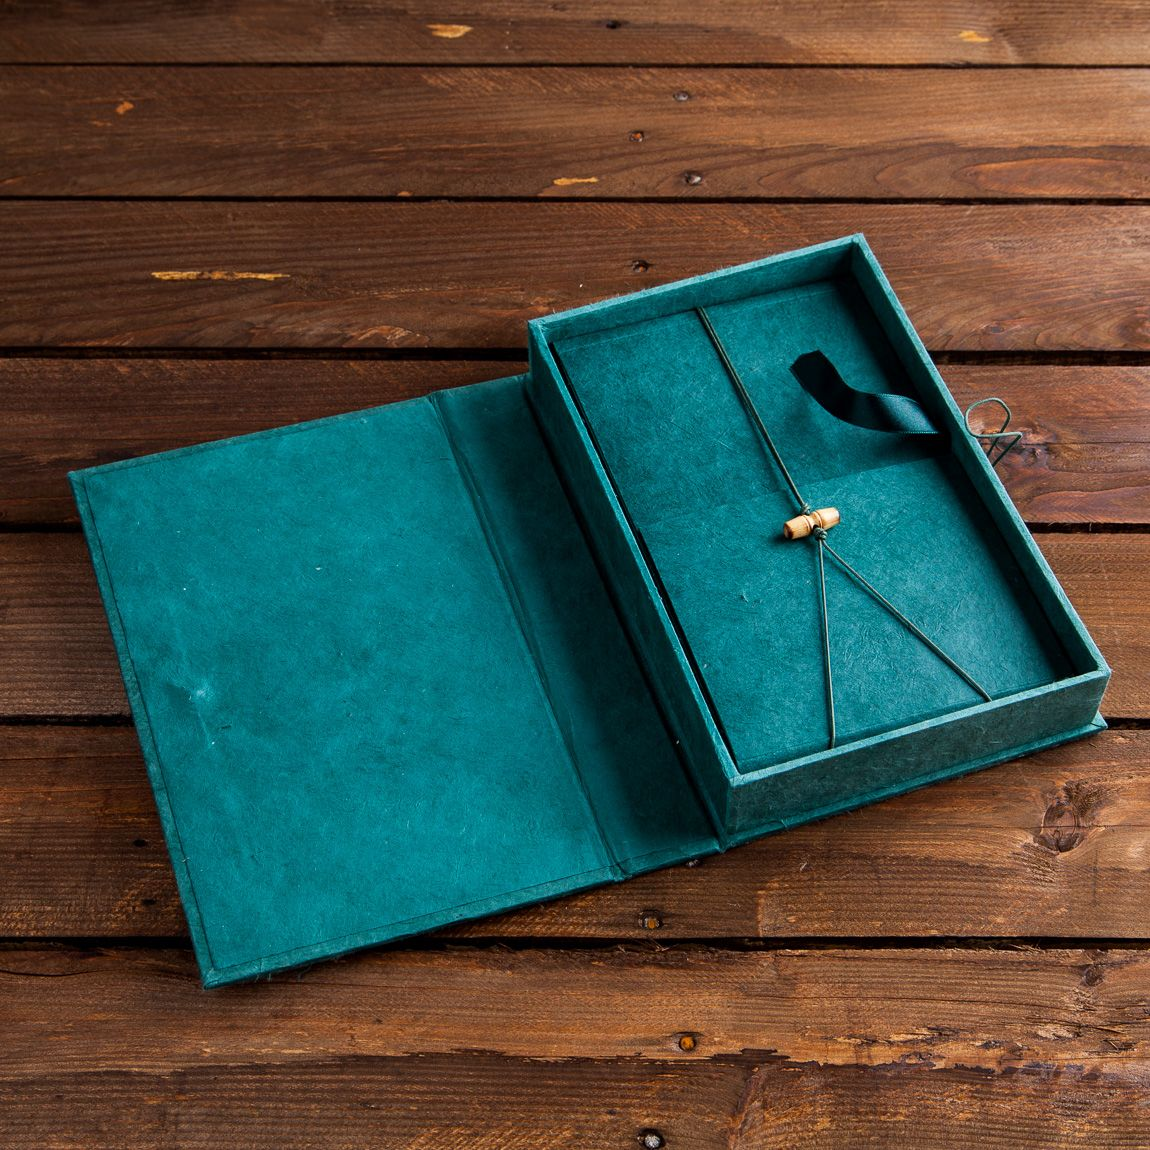 Caja Asia Verde con libro